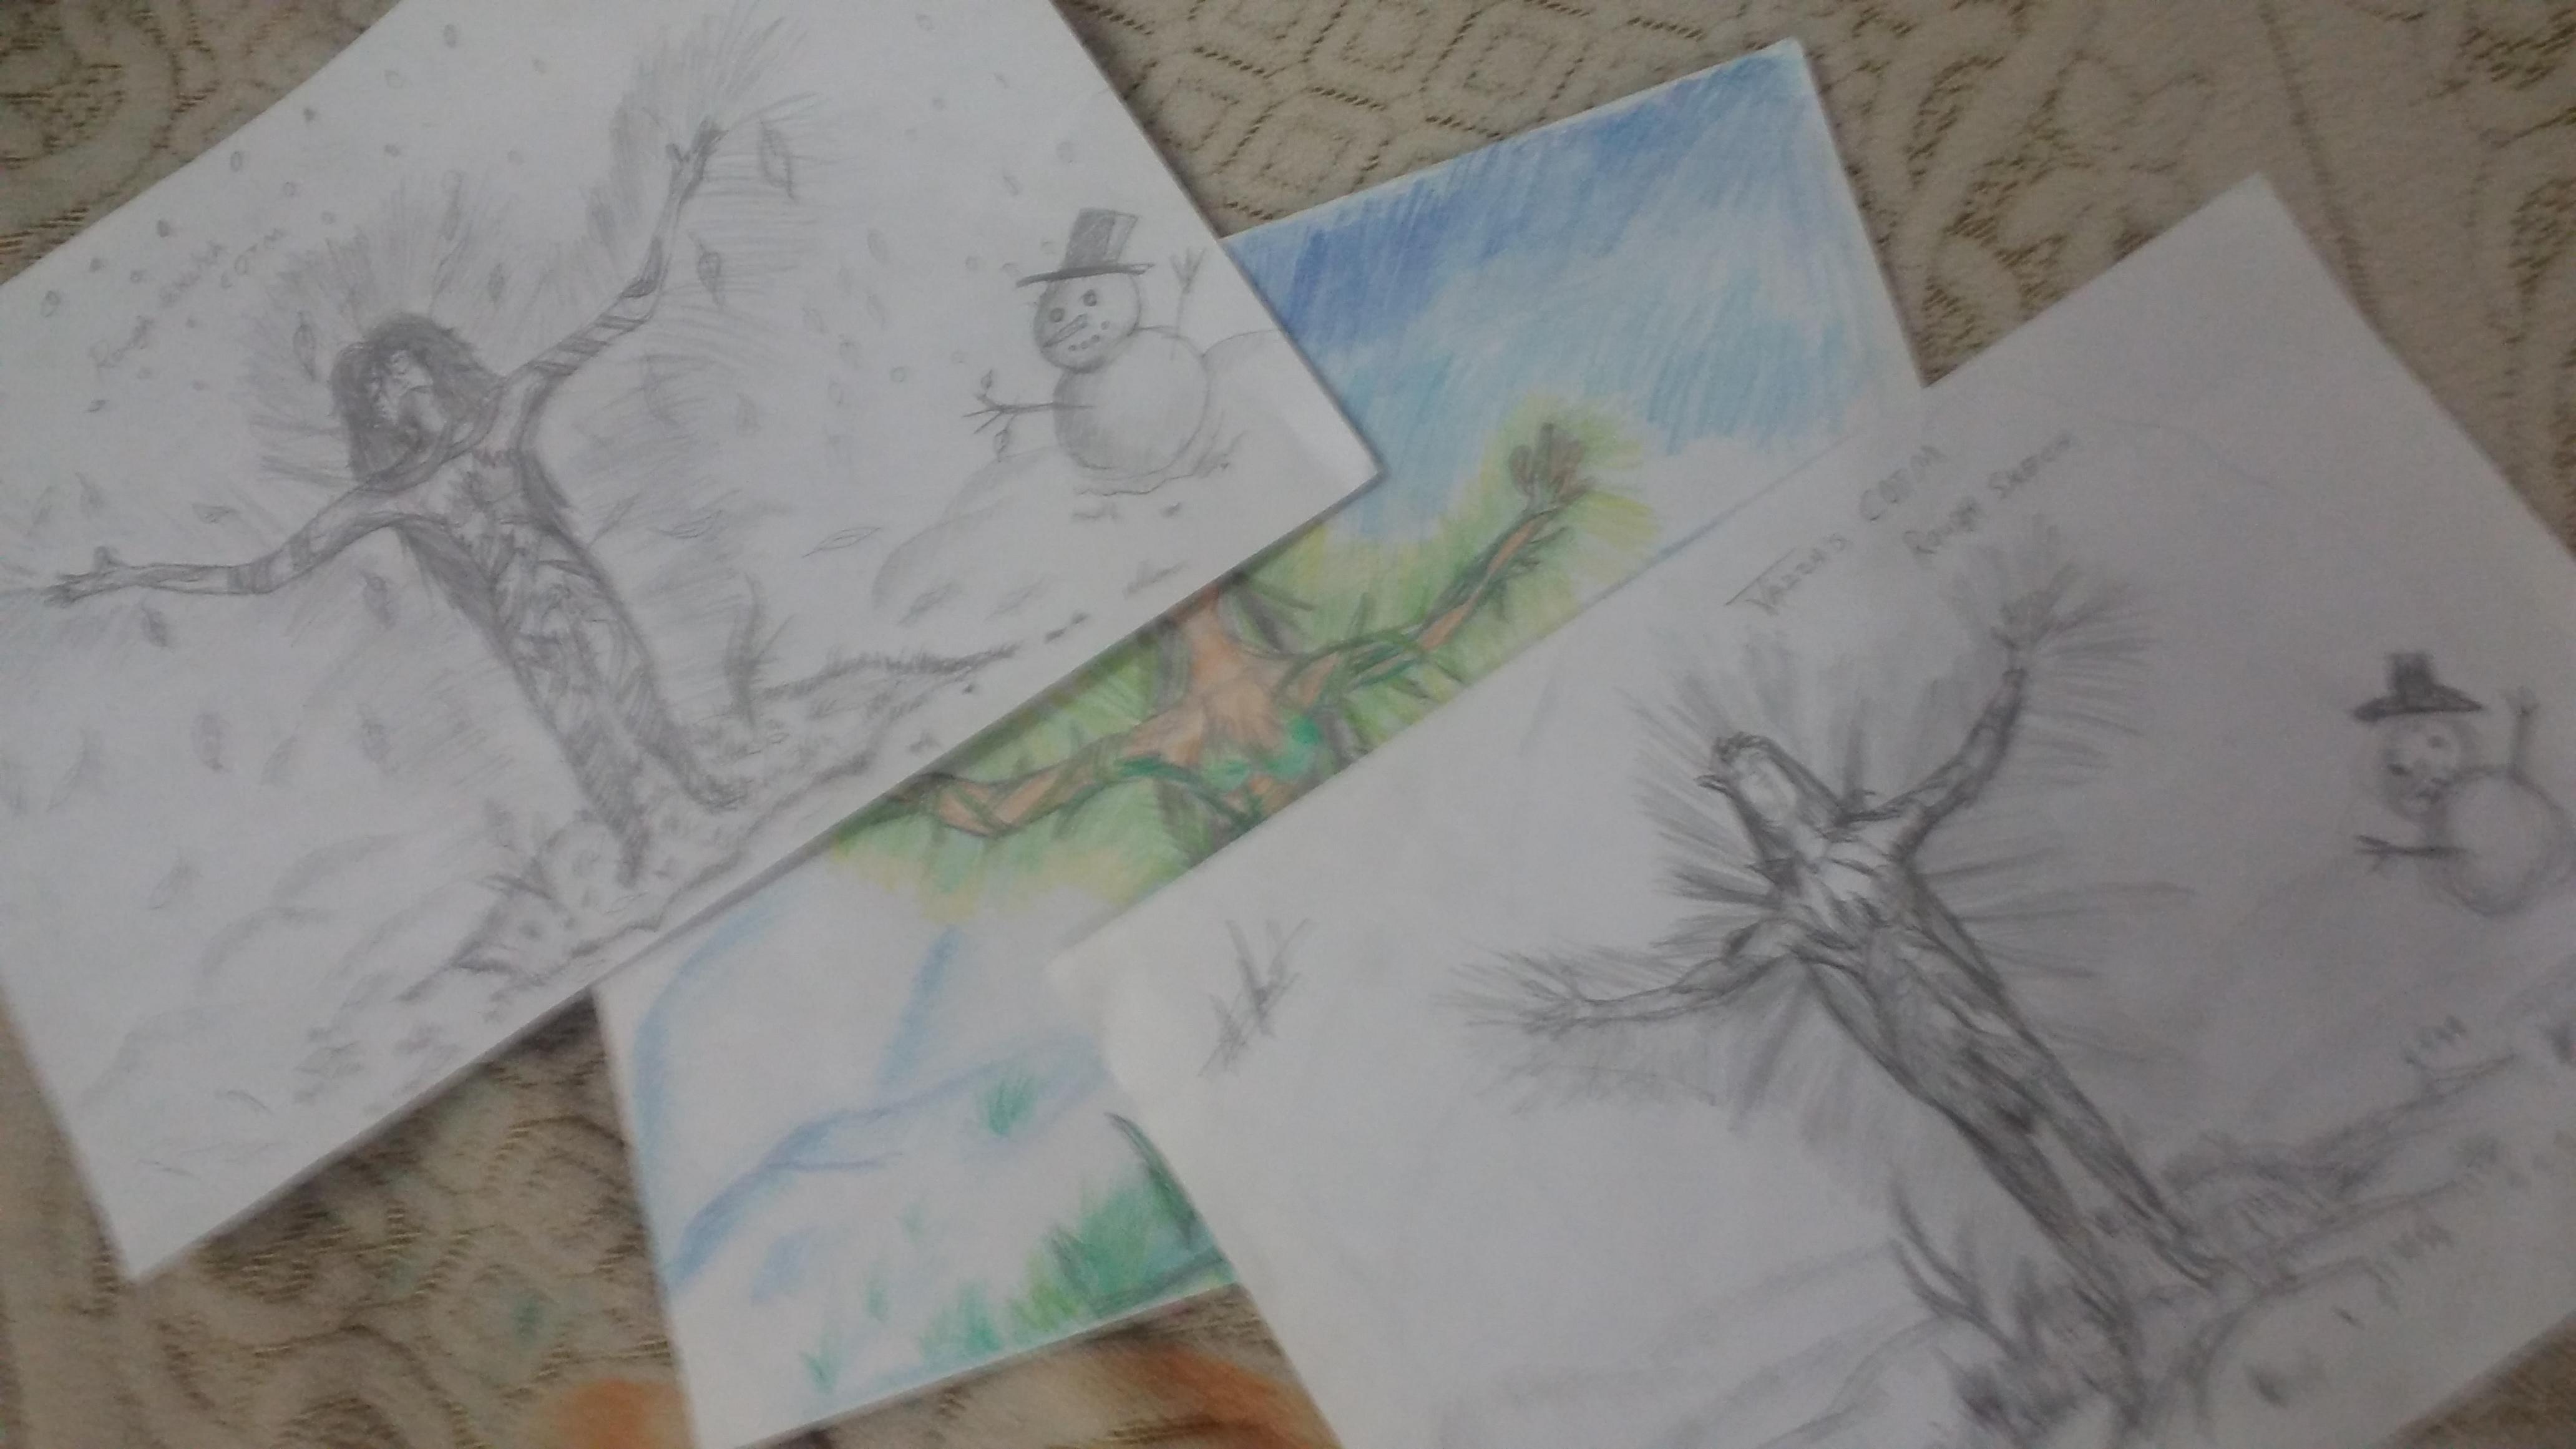 COTM rough sketches